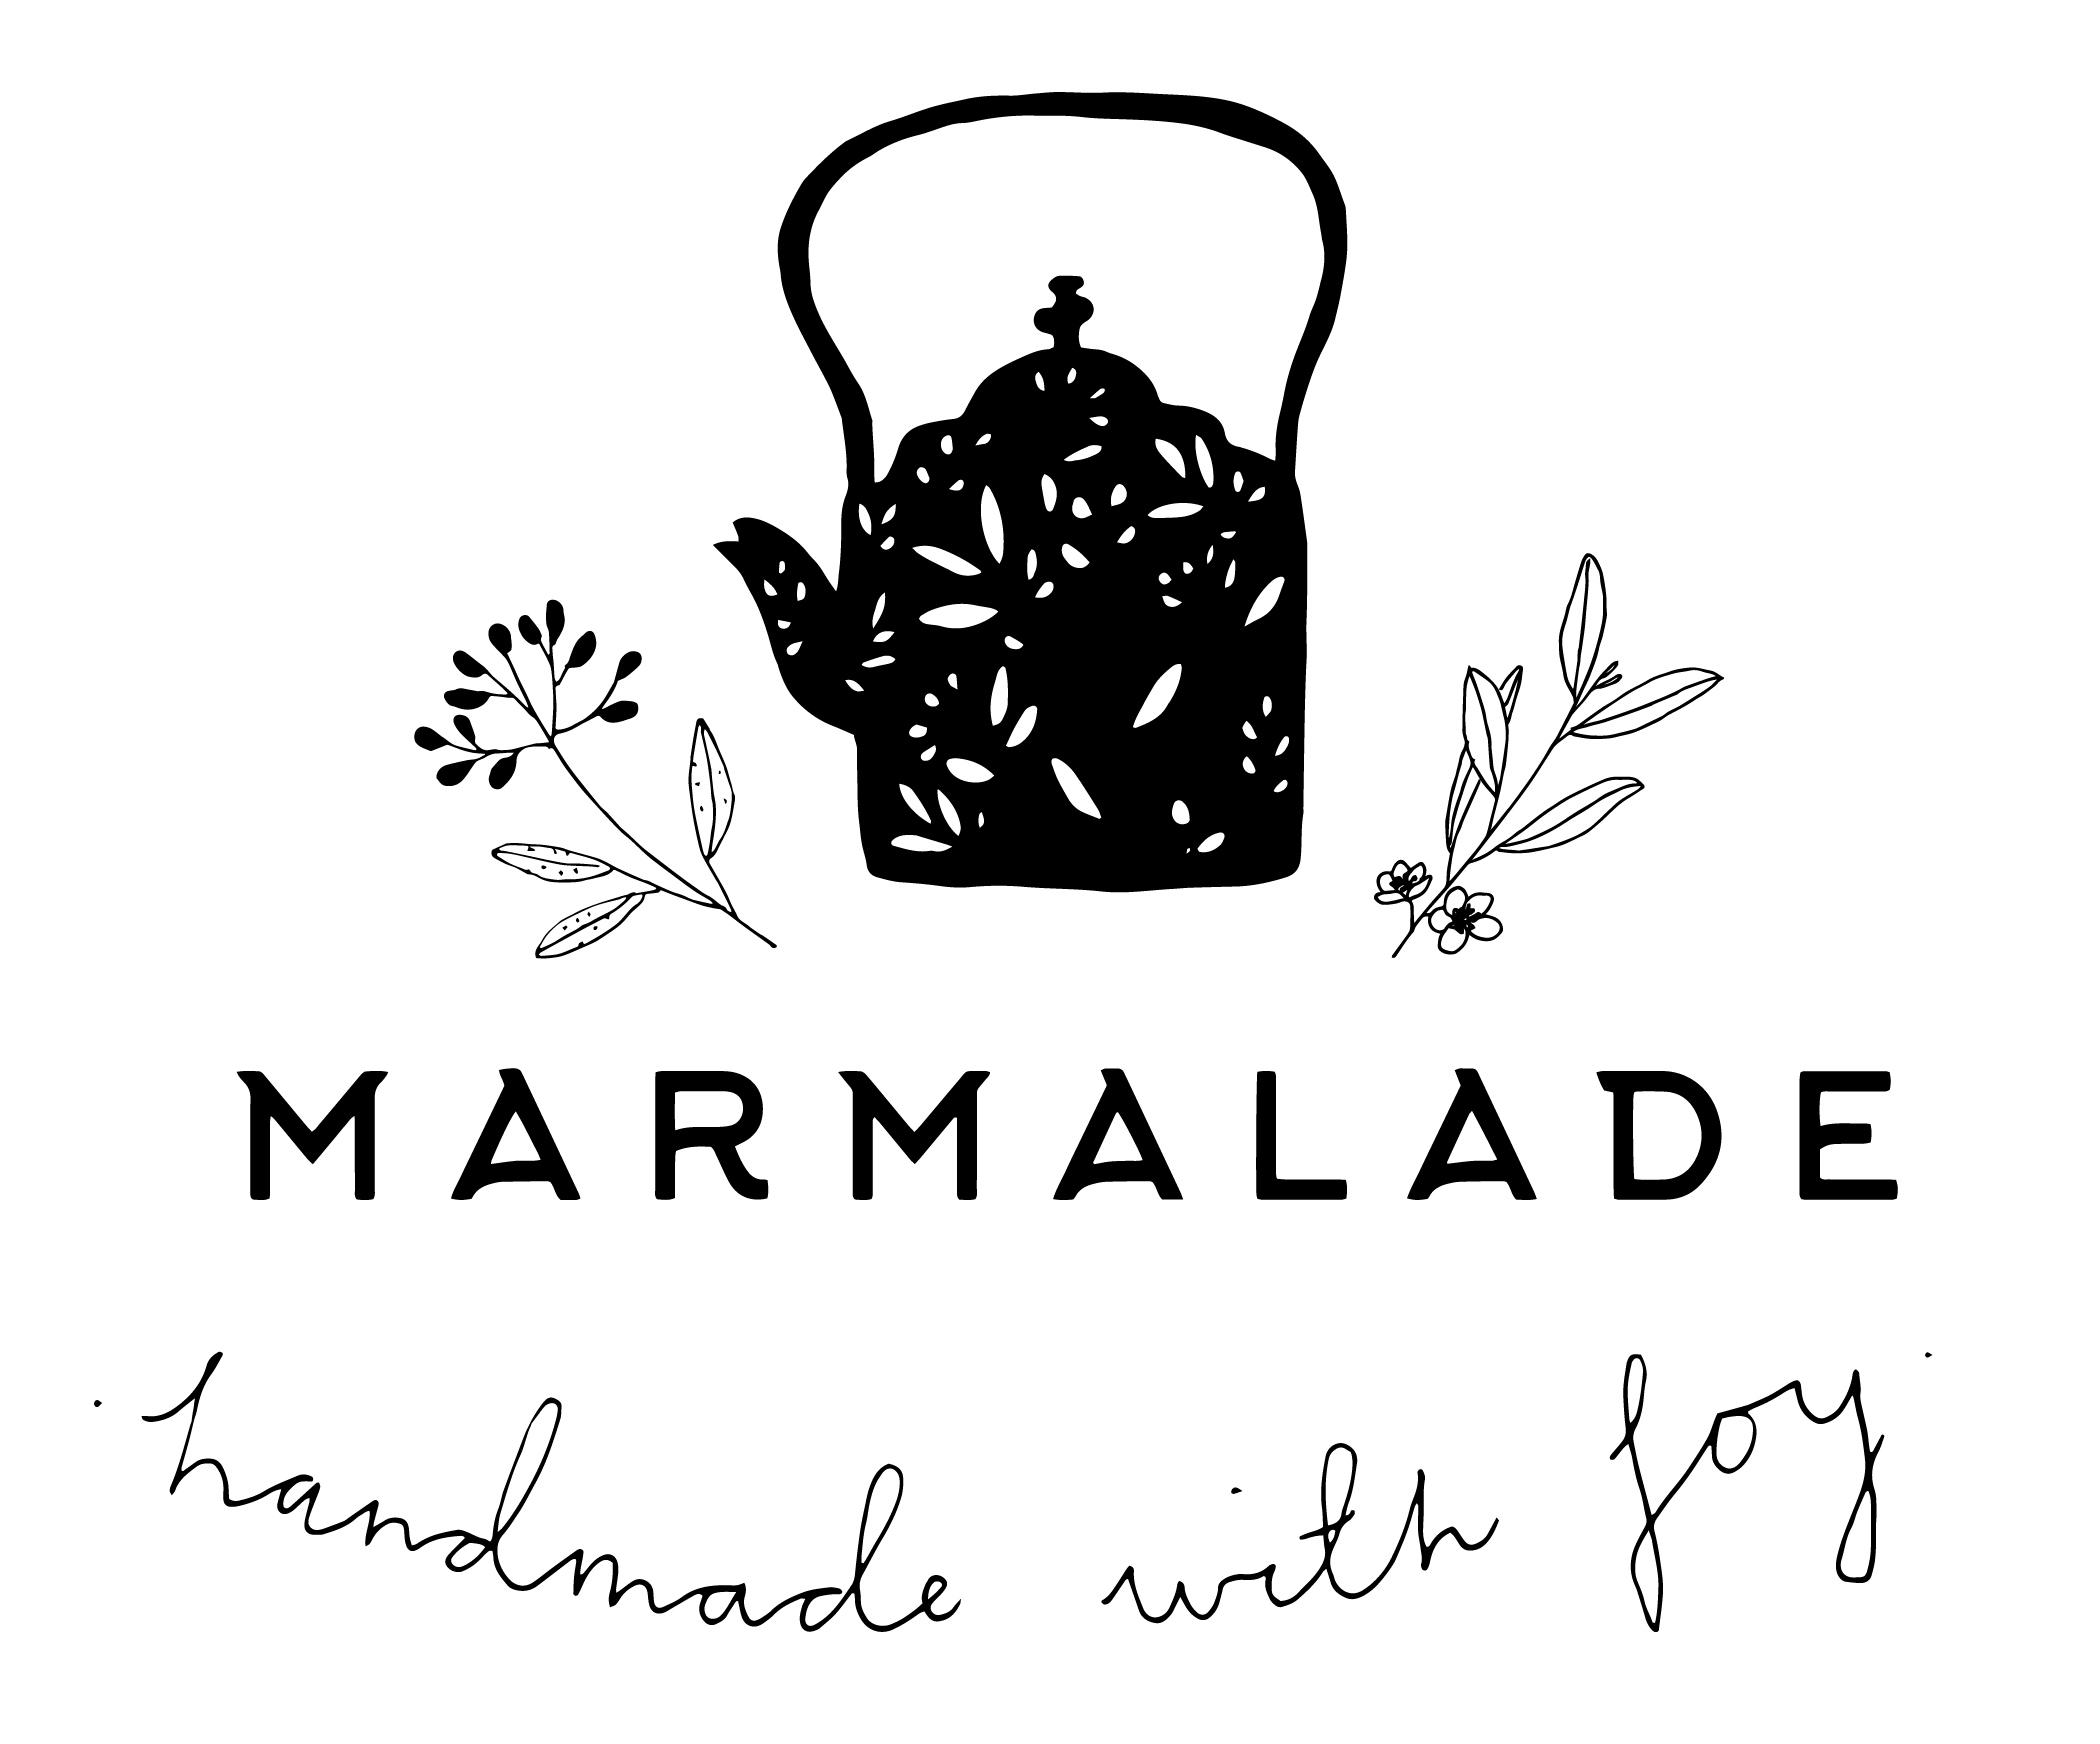 Marmalade logo final.jpg